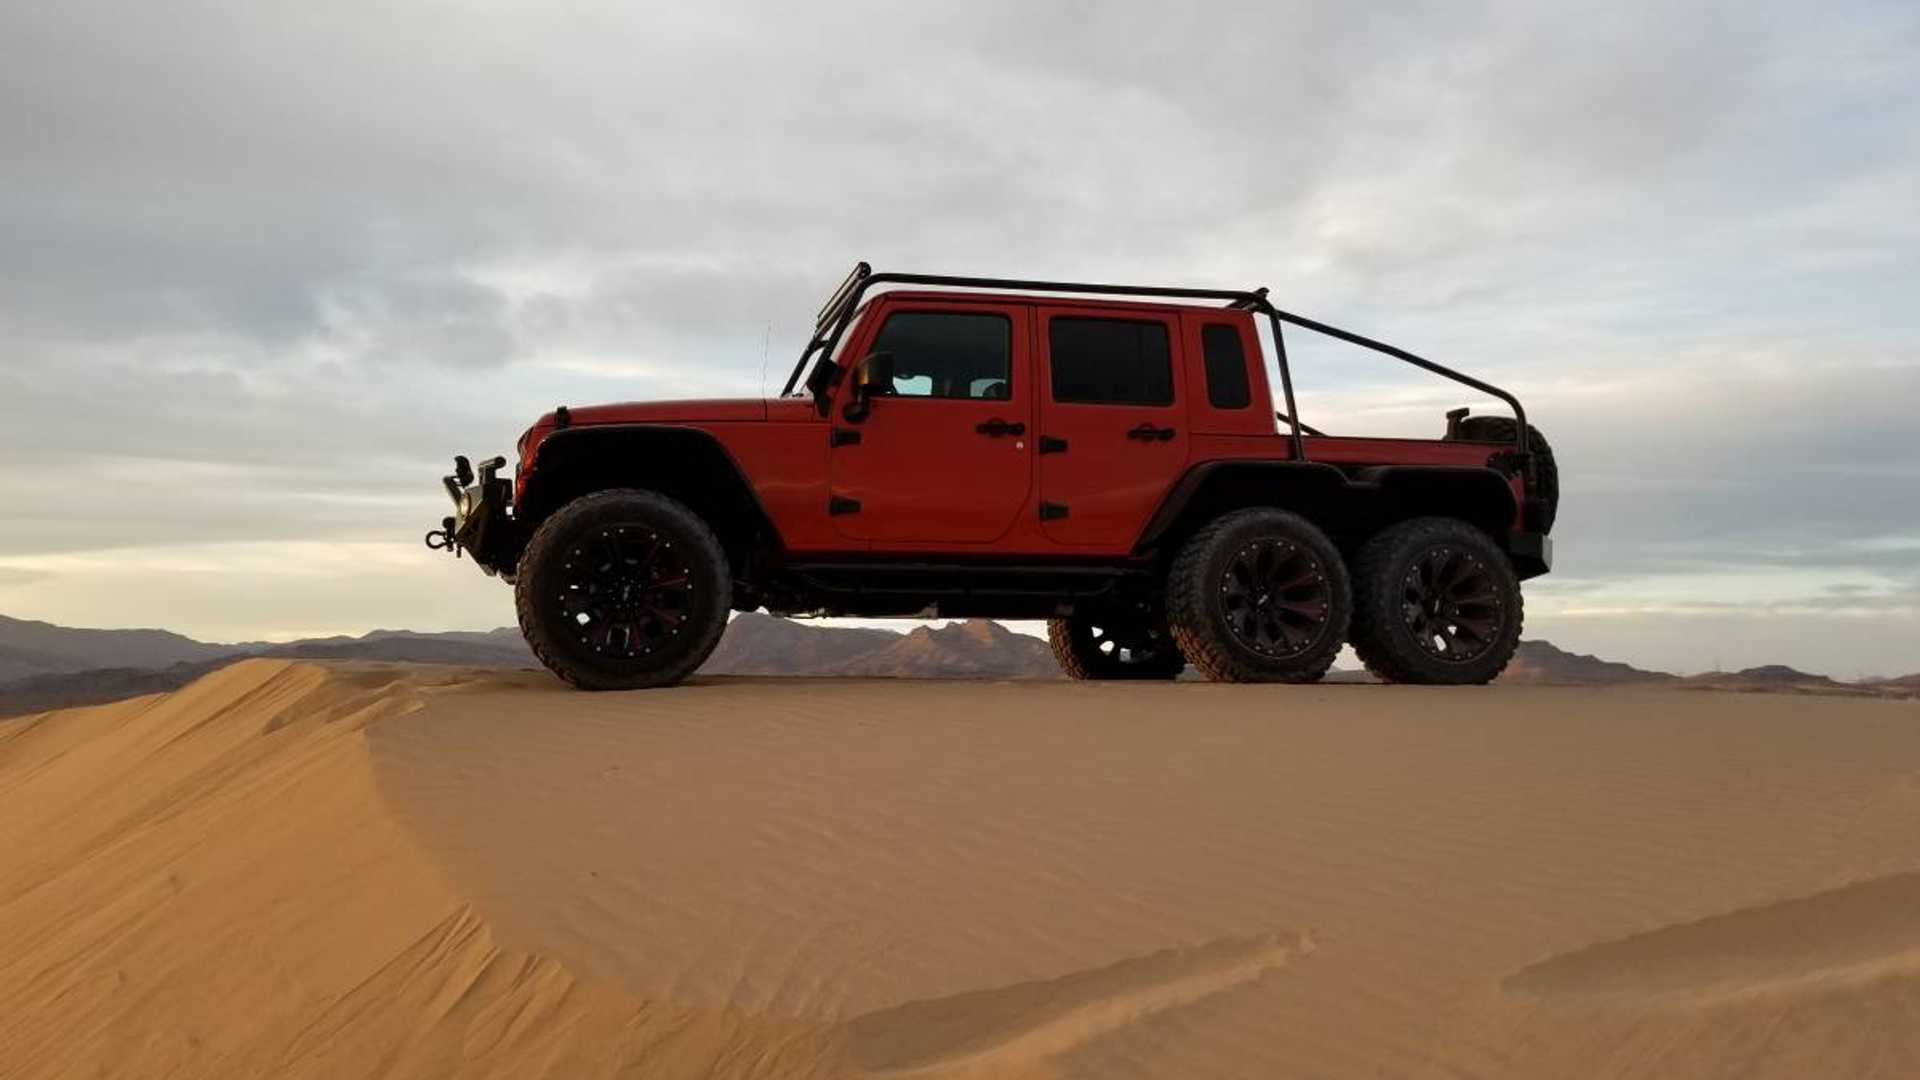 Hellcat motorlu Jeep Wrangler 6x6